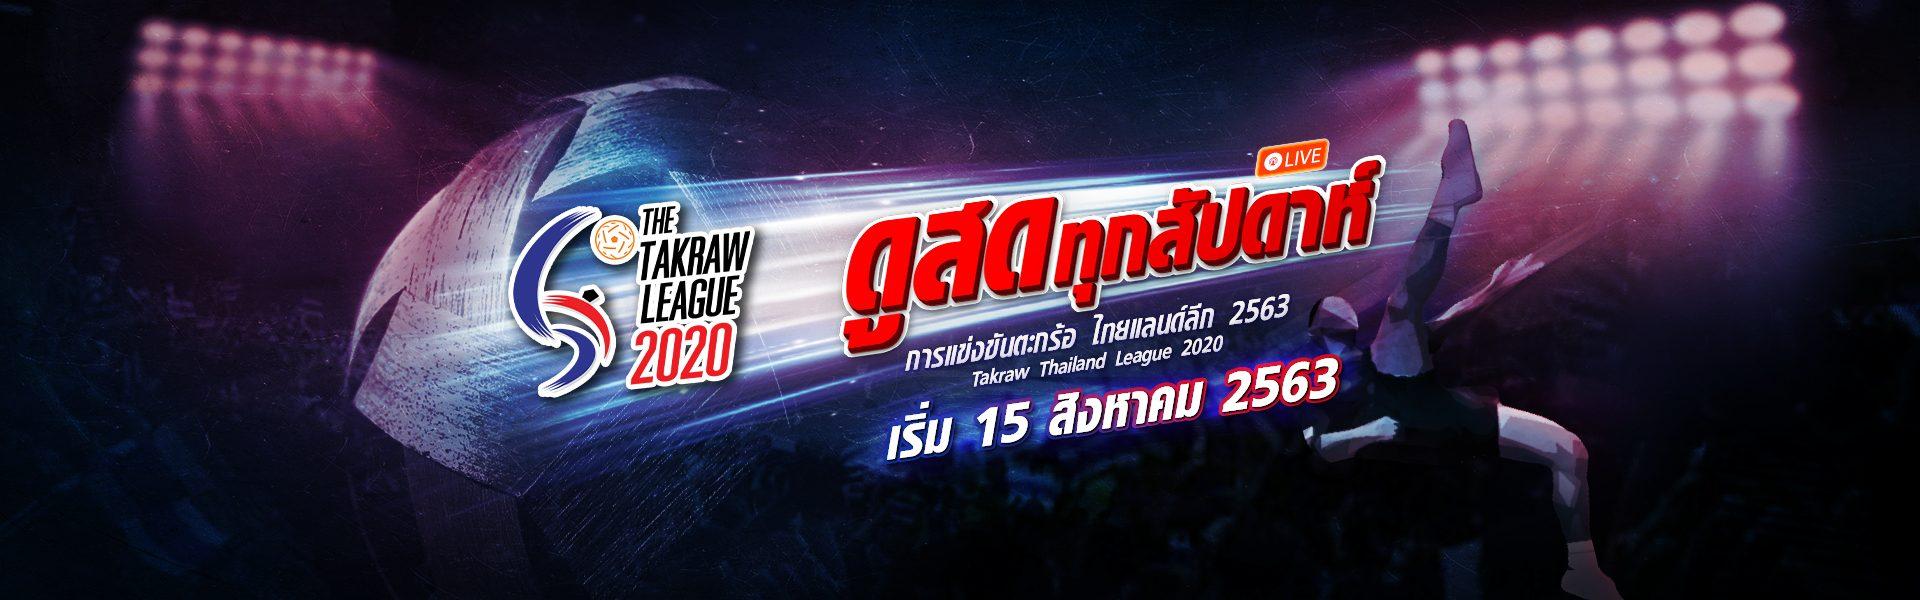 Takraw League 2020